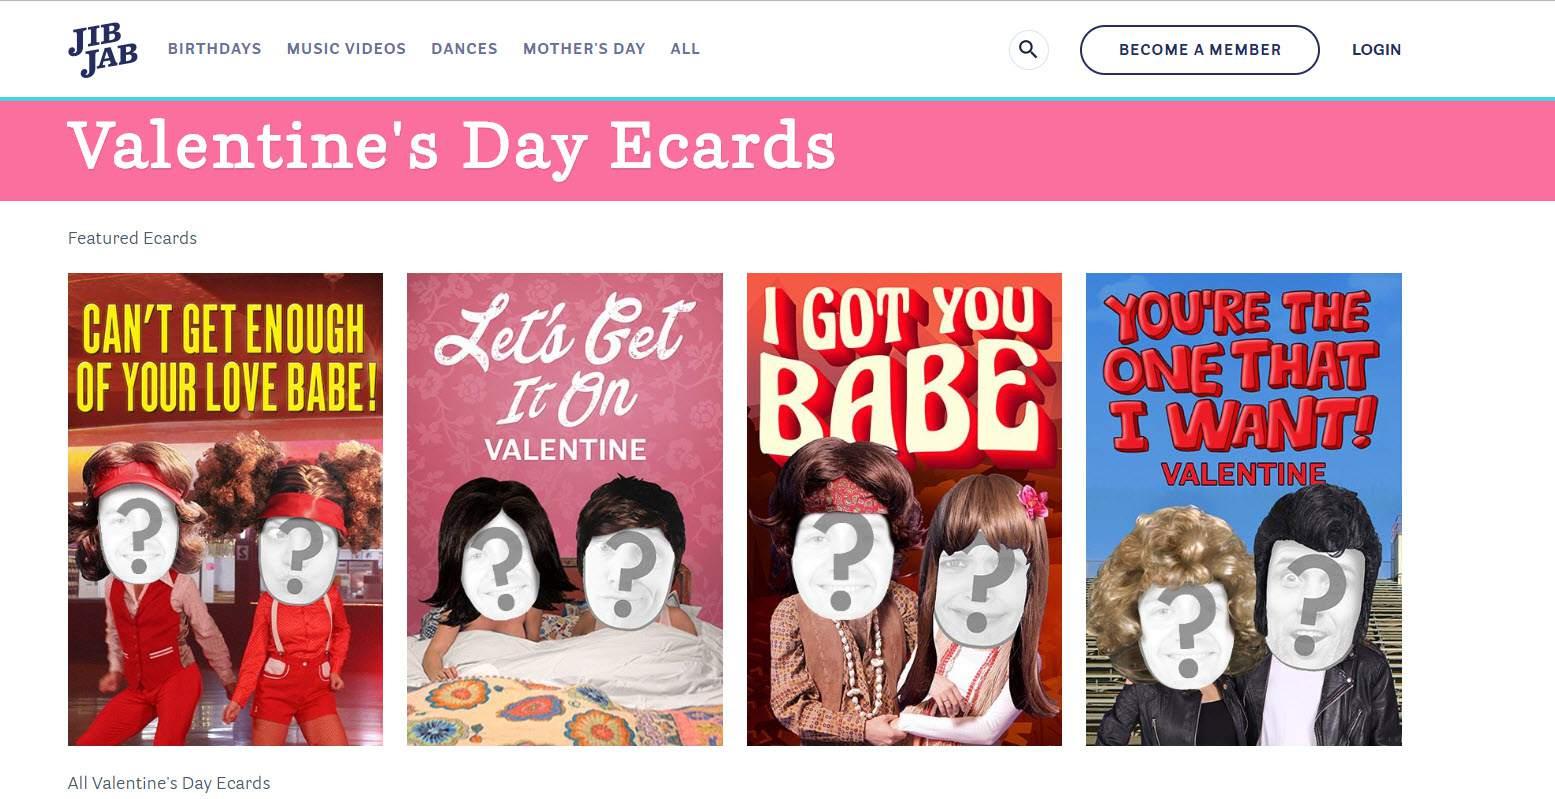 Send Valentines To Your Internet Friends